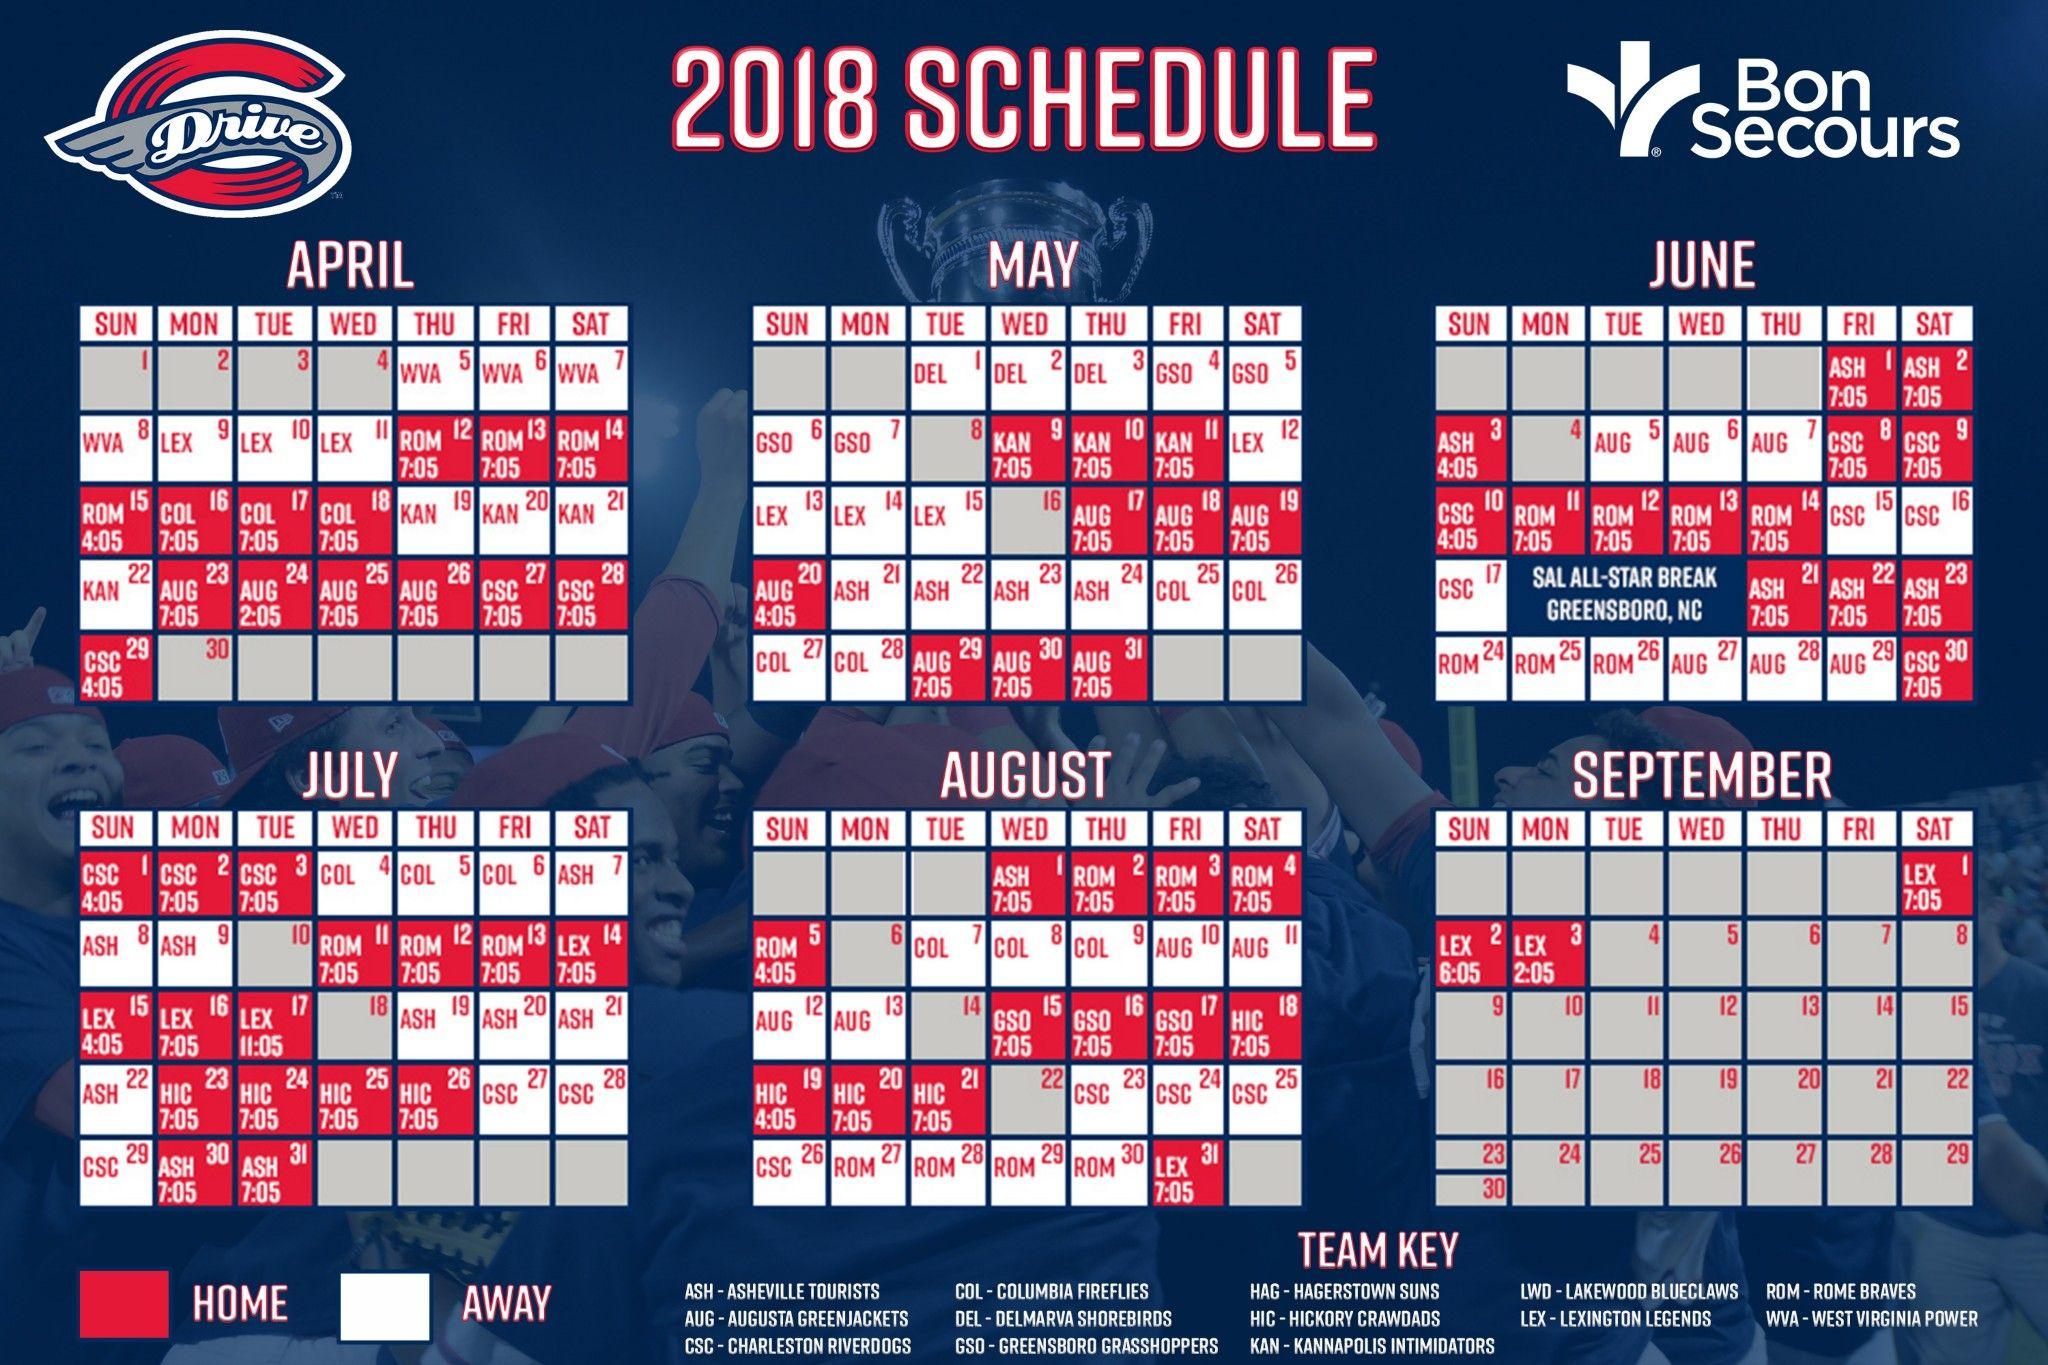 Pin By Shaun Sorenson On Sports Braves Schedule